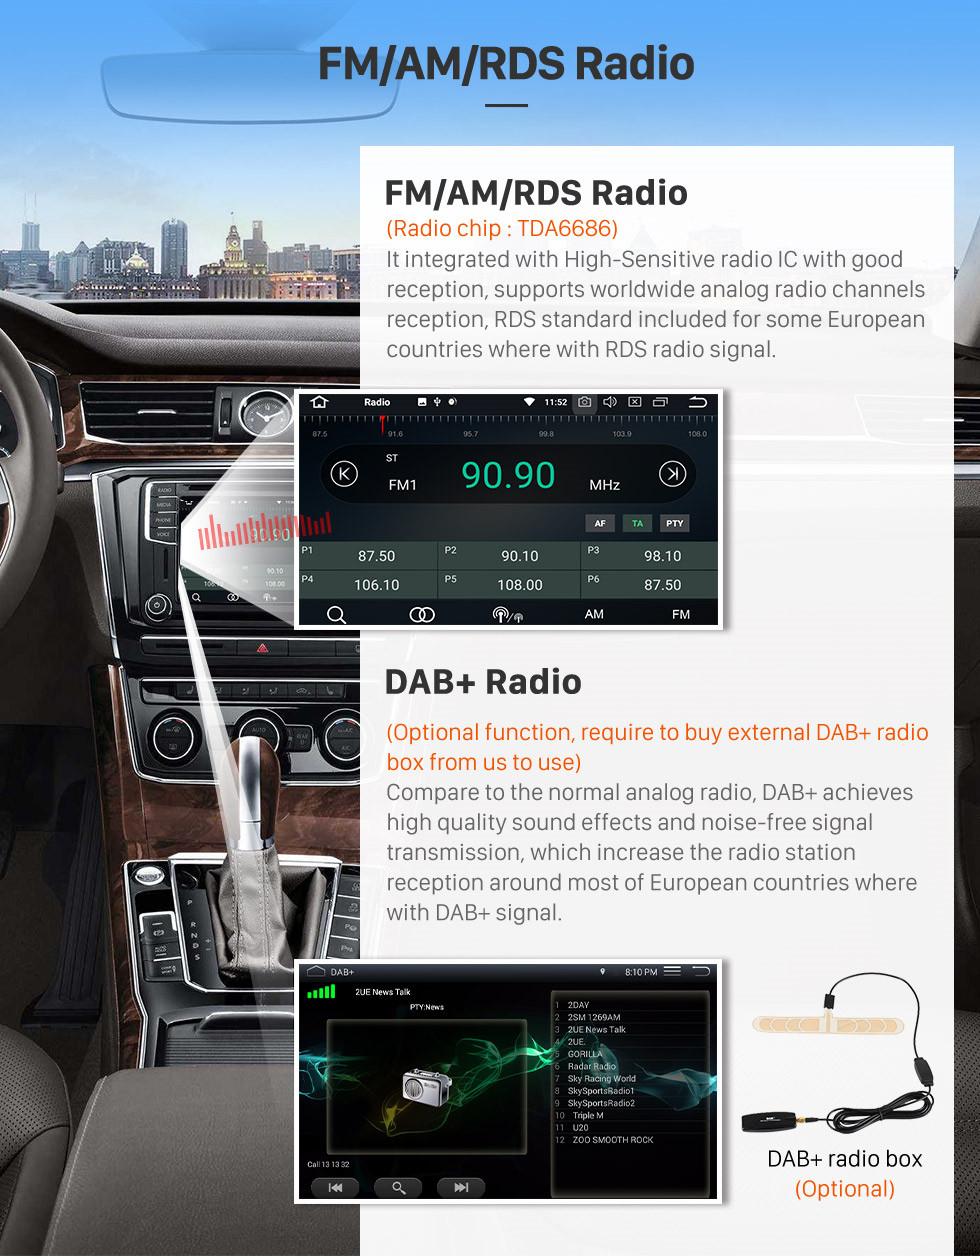 Seicane Aftermarket GPS 2005-2010 Chrysler Sebring Aspen 300C Cirrus Android 9.0 Radio Navigation system WIFI USB SD Bluetooth DVD Player Support Digital TV Rearview Camera Steering Wheel Control